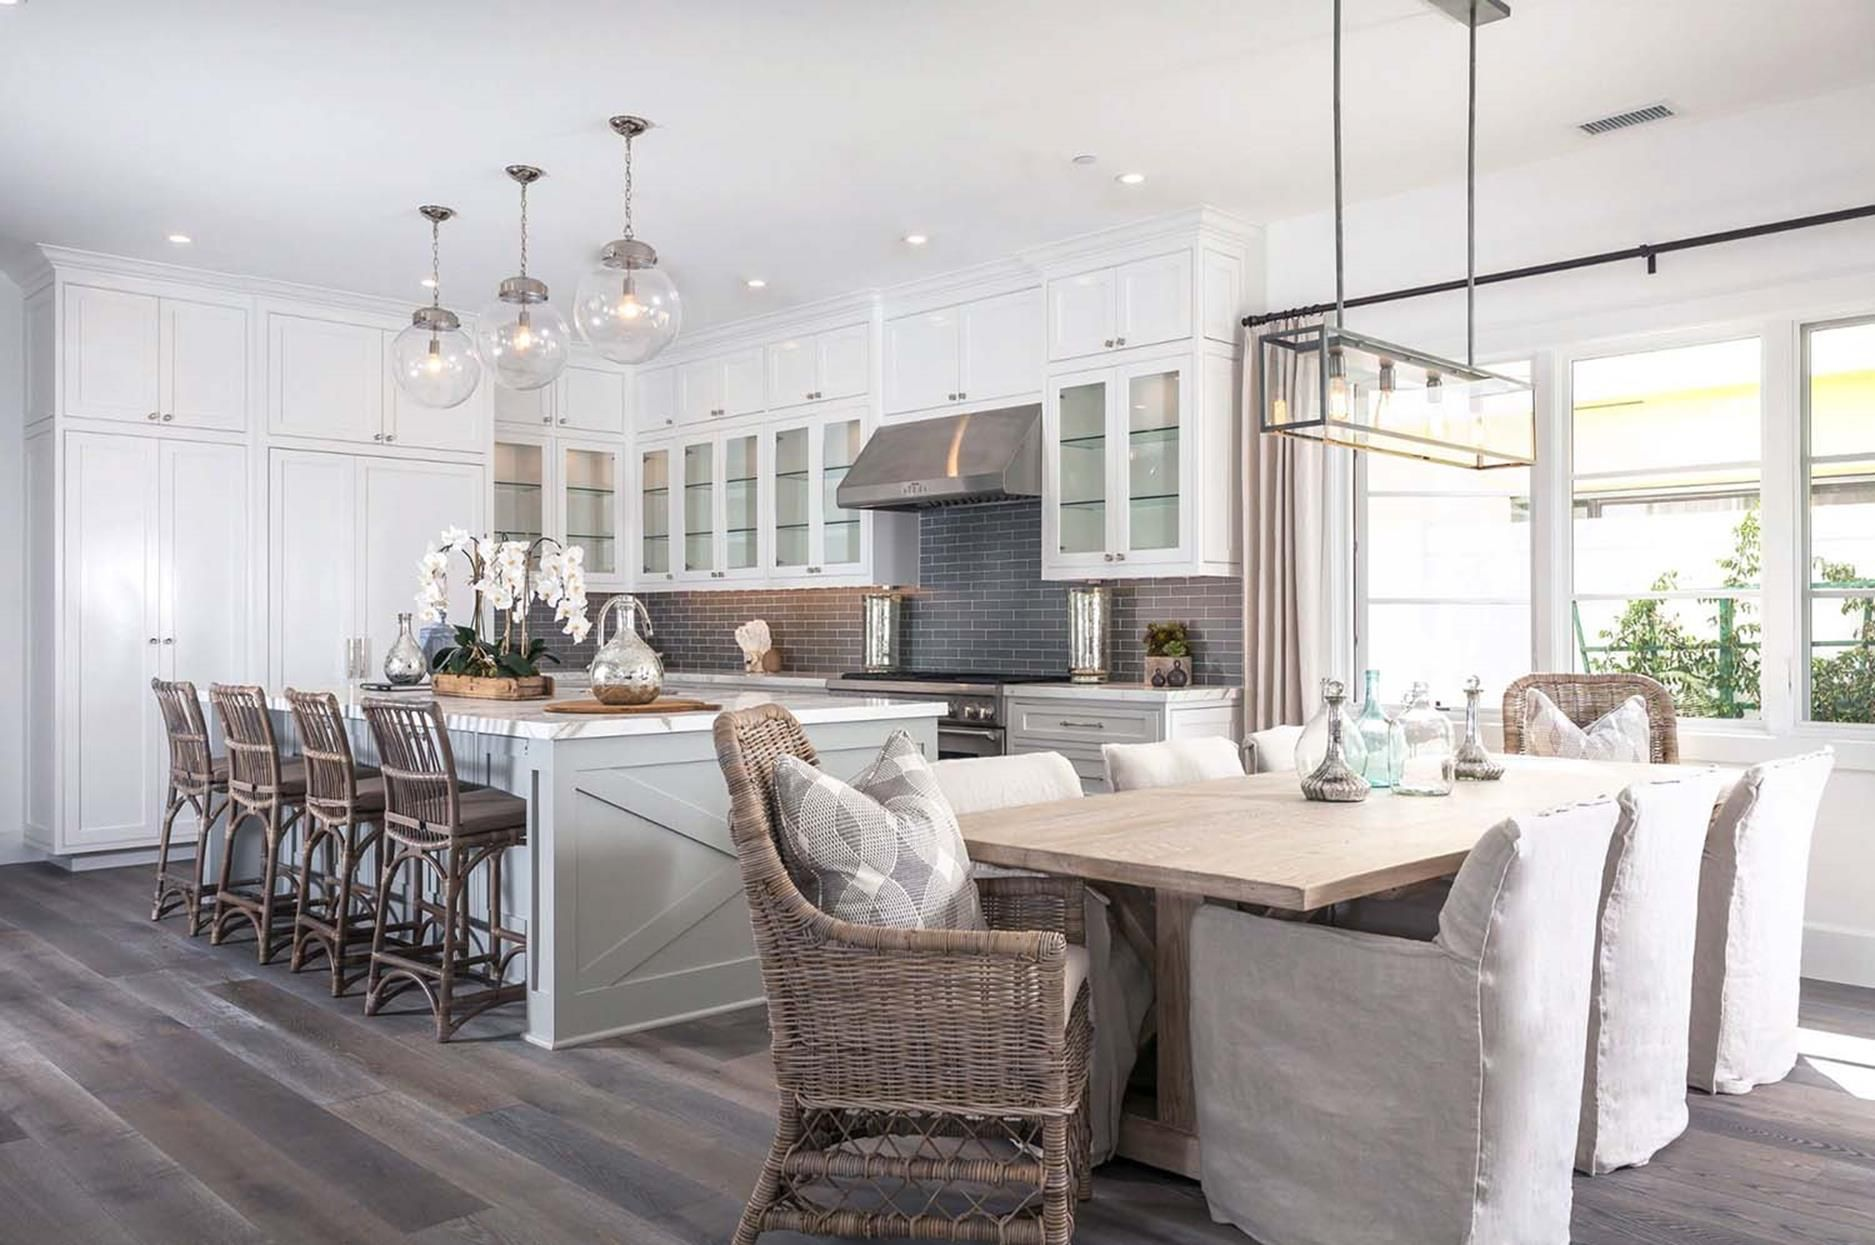 Coastal Farmhouse Decor 28 Daily Home List Design cool